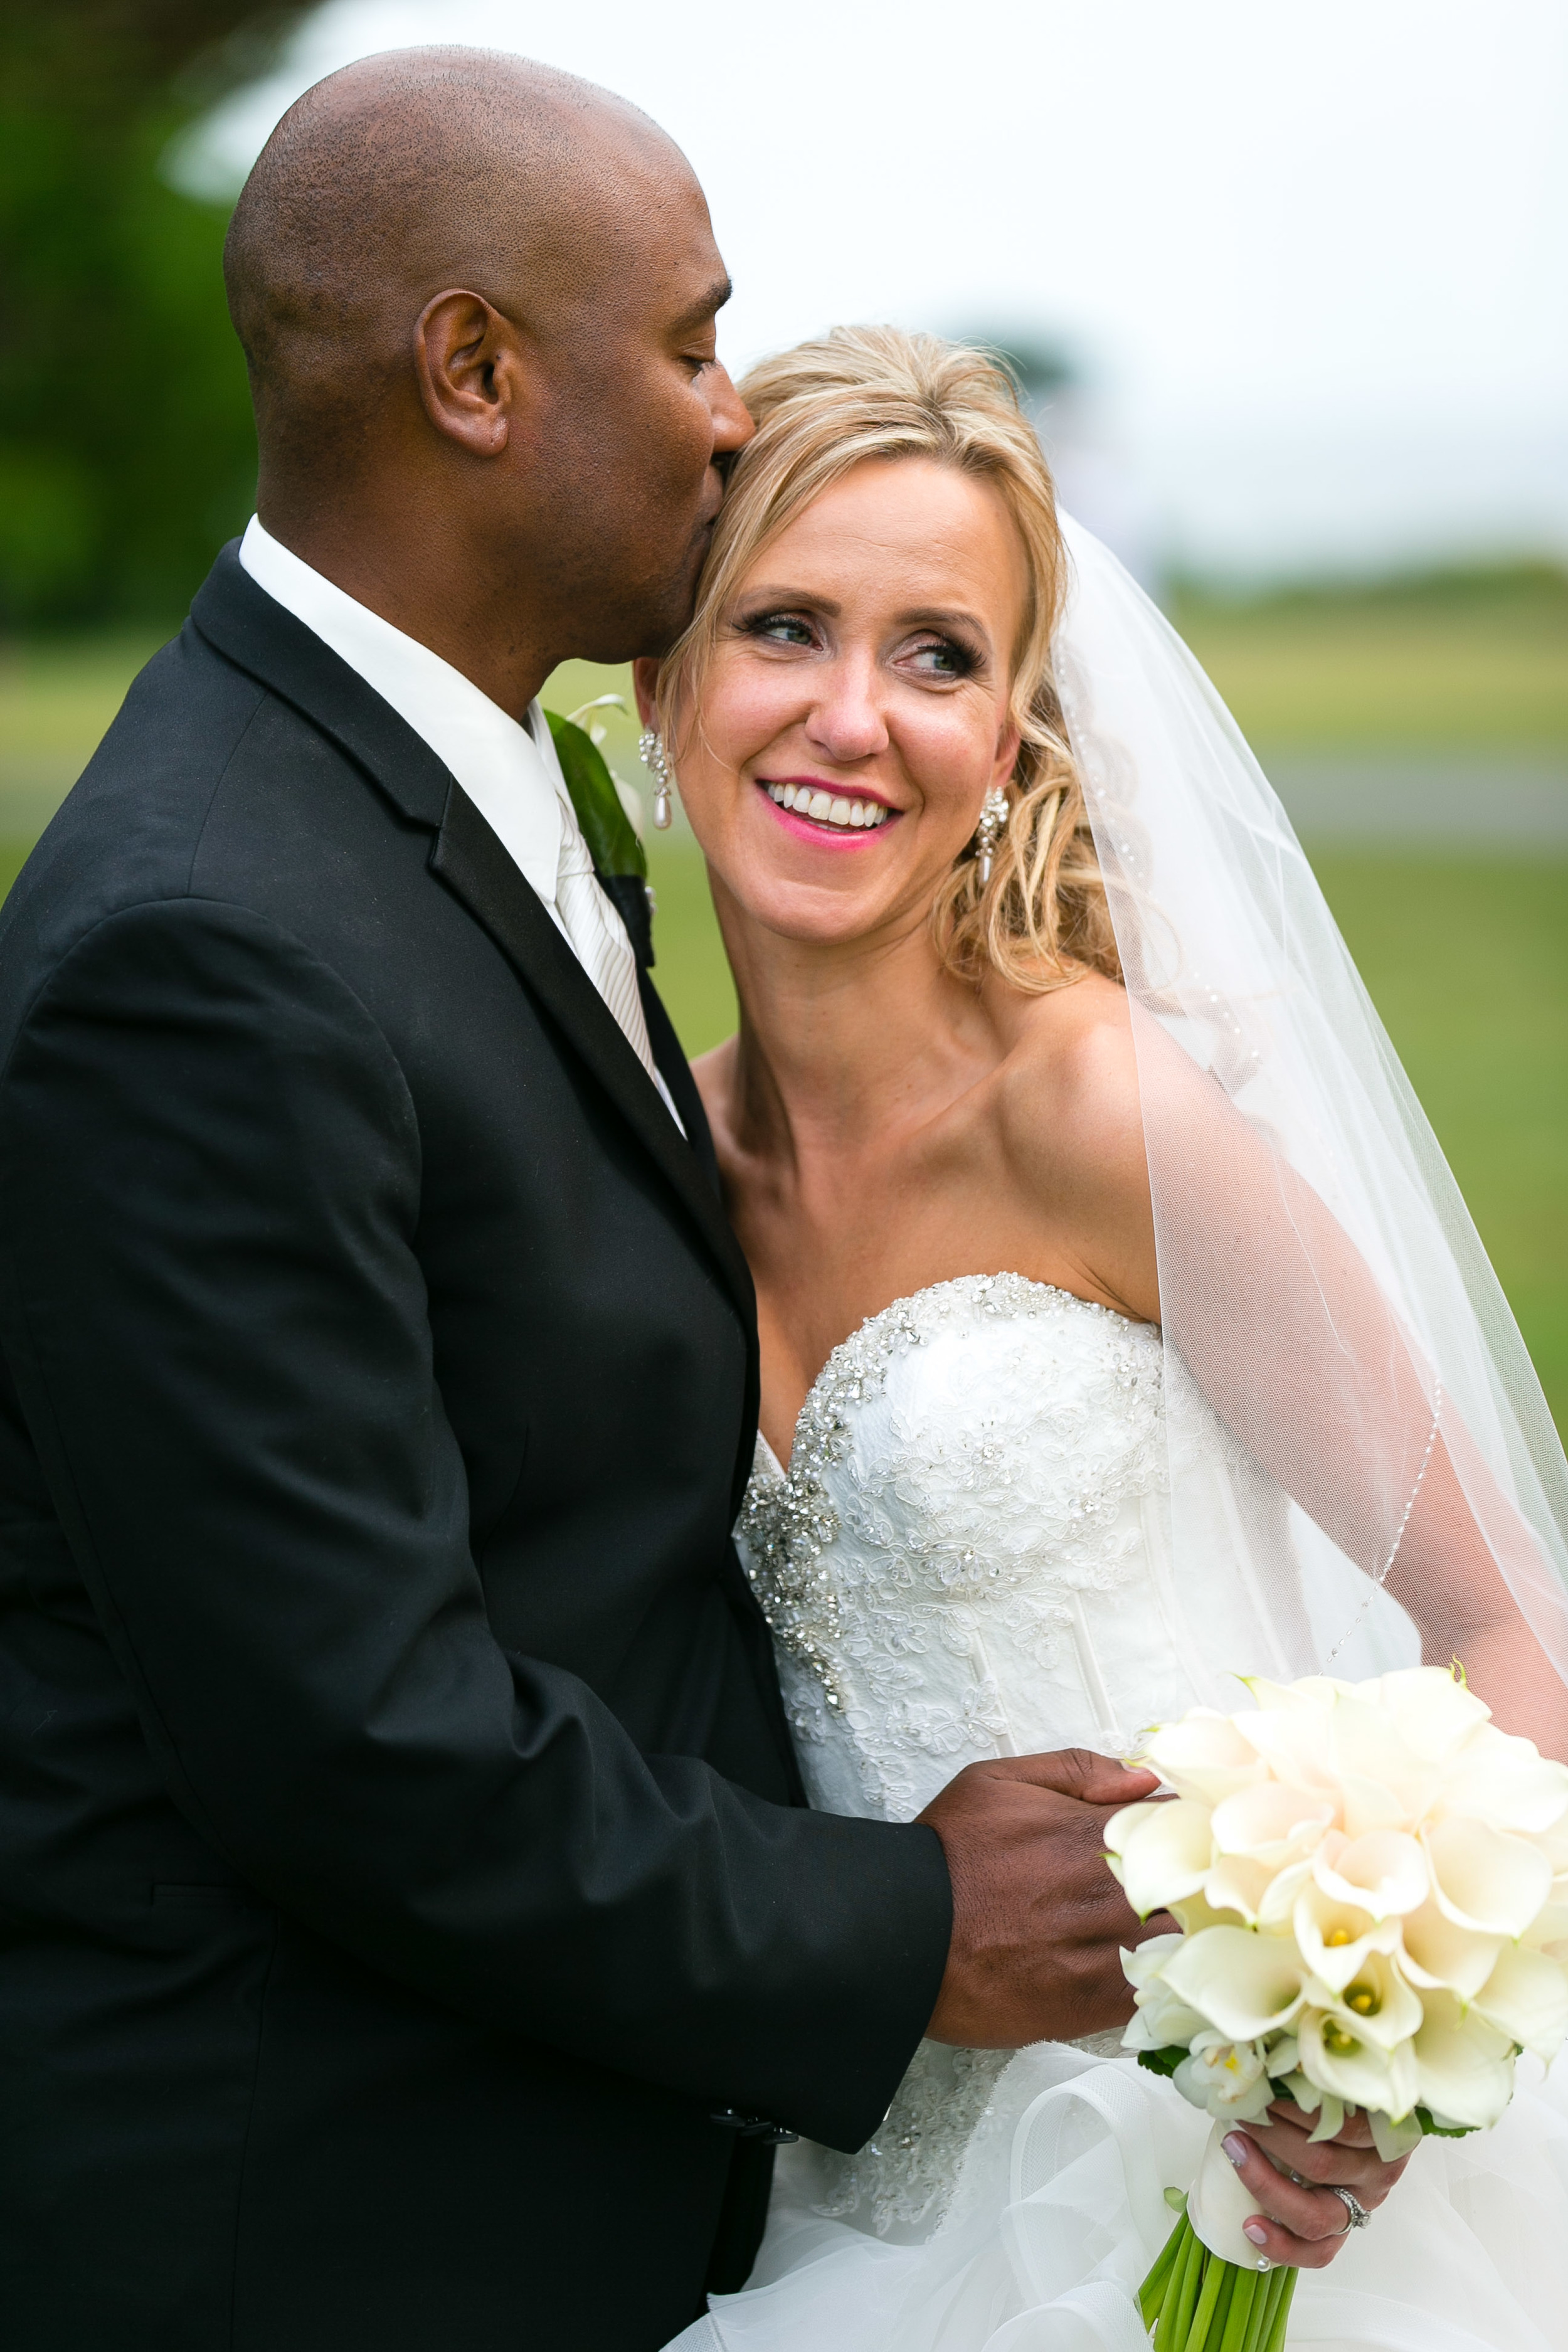 Elegant-American-Wedding-Harkness-Mystic-CT-Documentary-Wedding-Photographer-Jacek-Dolata-10.jpg